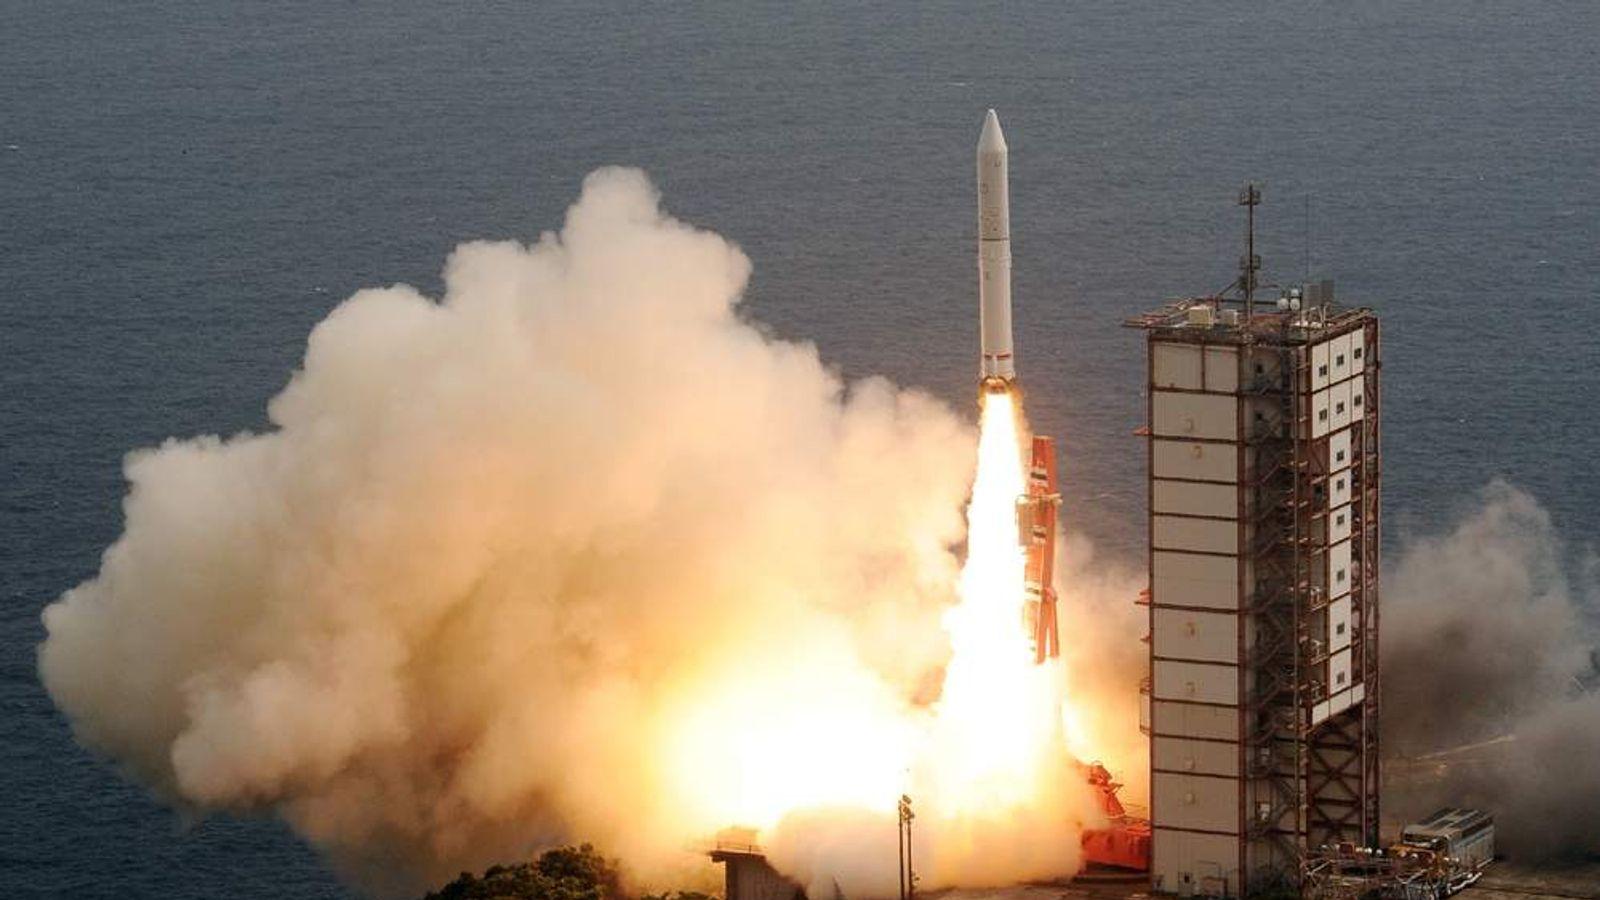 Japan's new solid-fuel rocket lifts off from the launch pad at the Japan Aerospace Exploration Agency's (JAXA) Uchinoura Space Center in Kimotsuki, Kagoshima